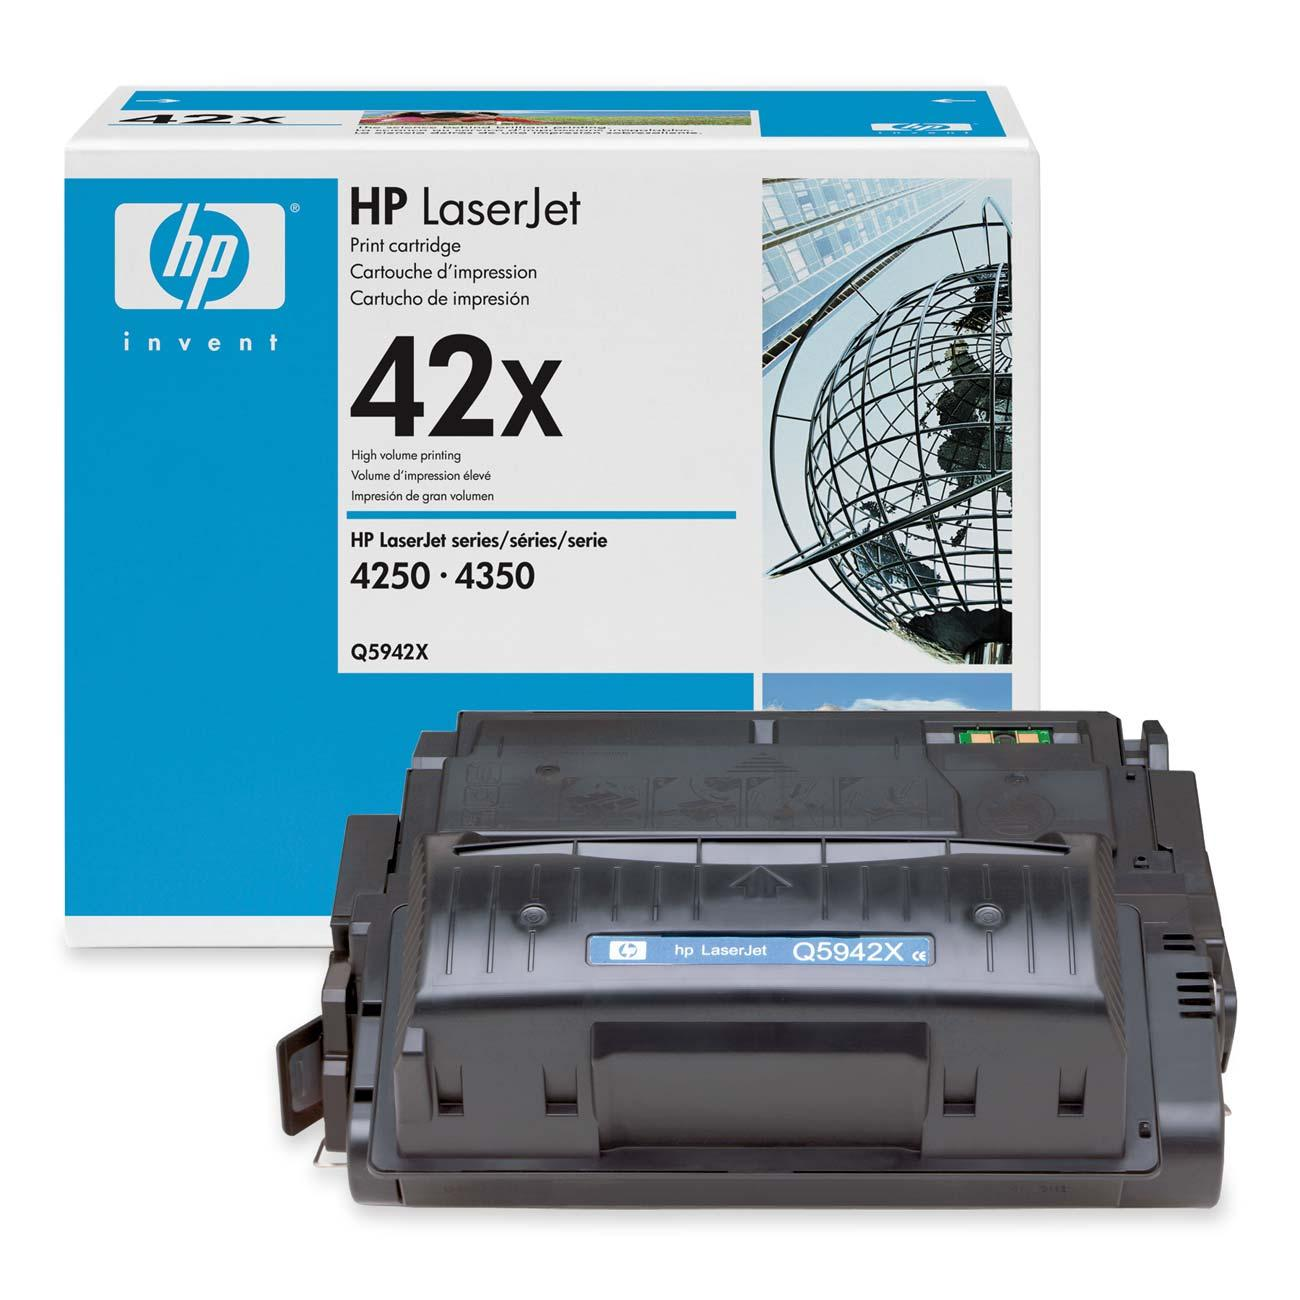 Восстановление картриджа Q5942X для HP LaserJet 4250